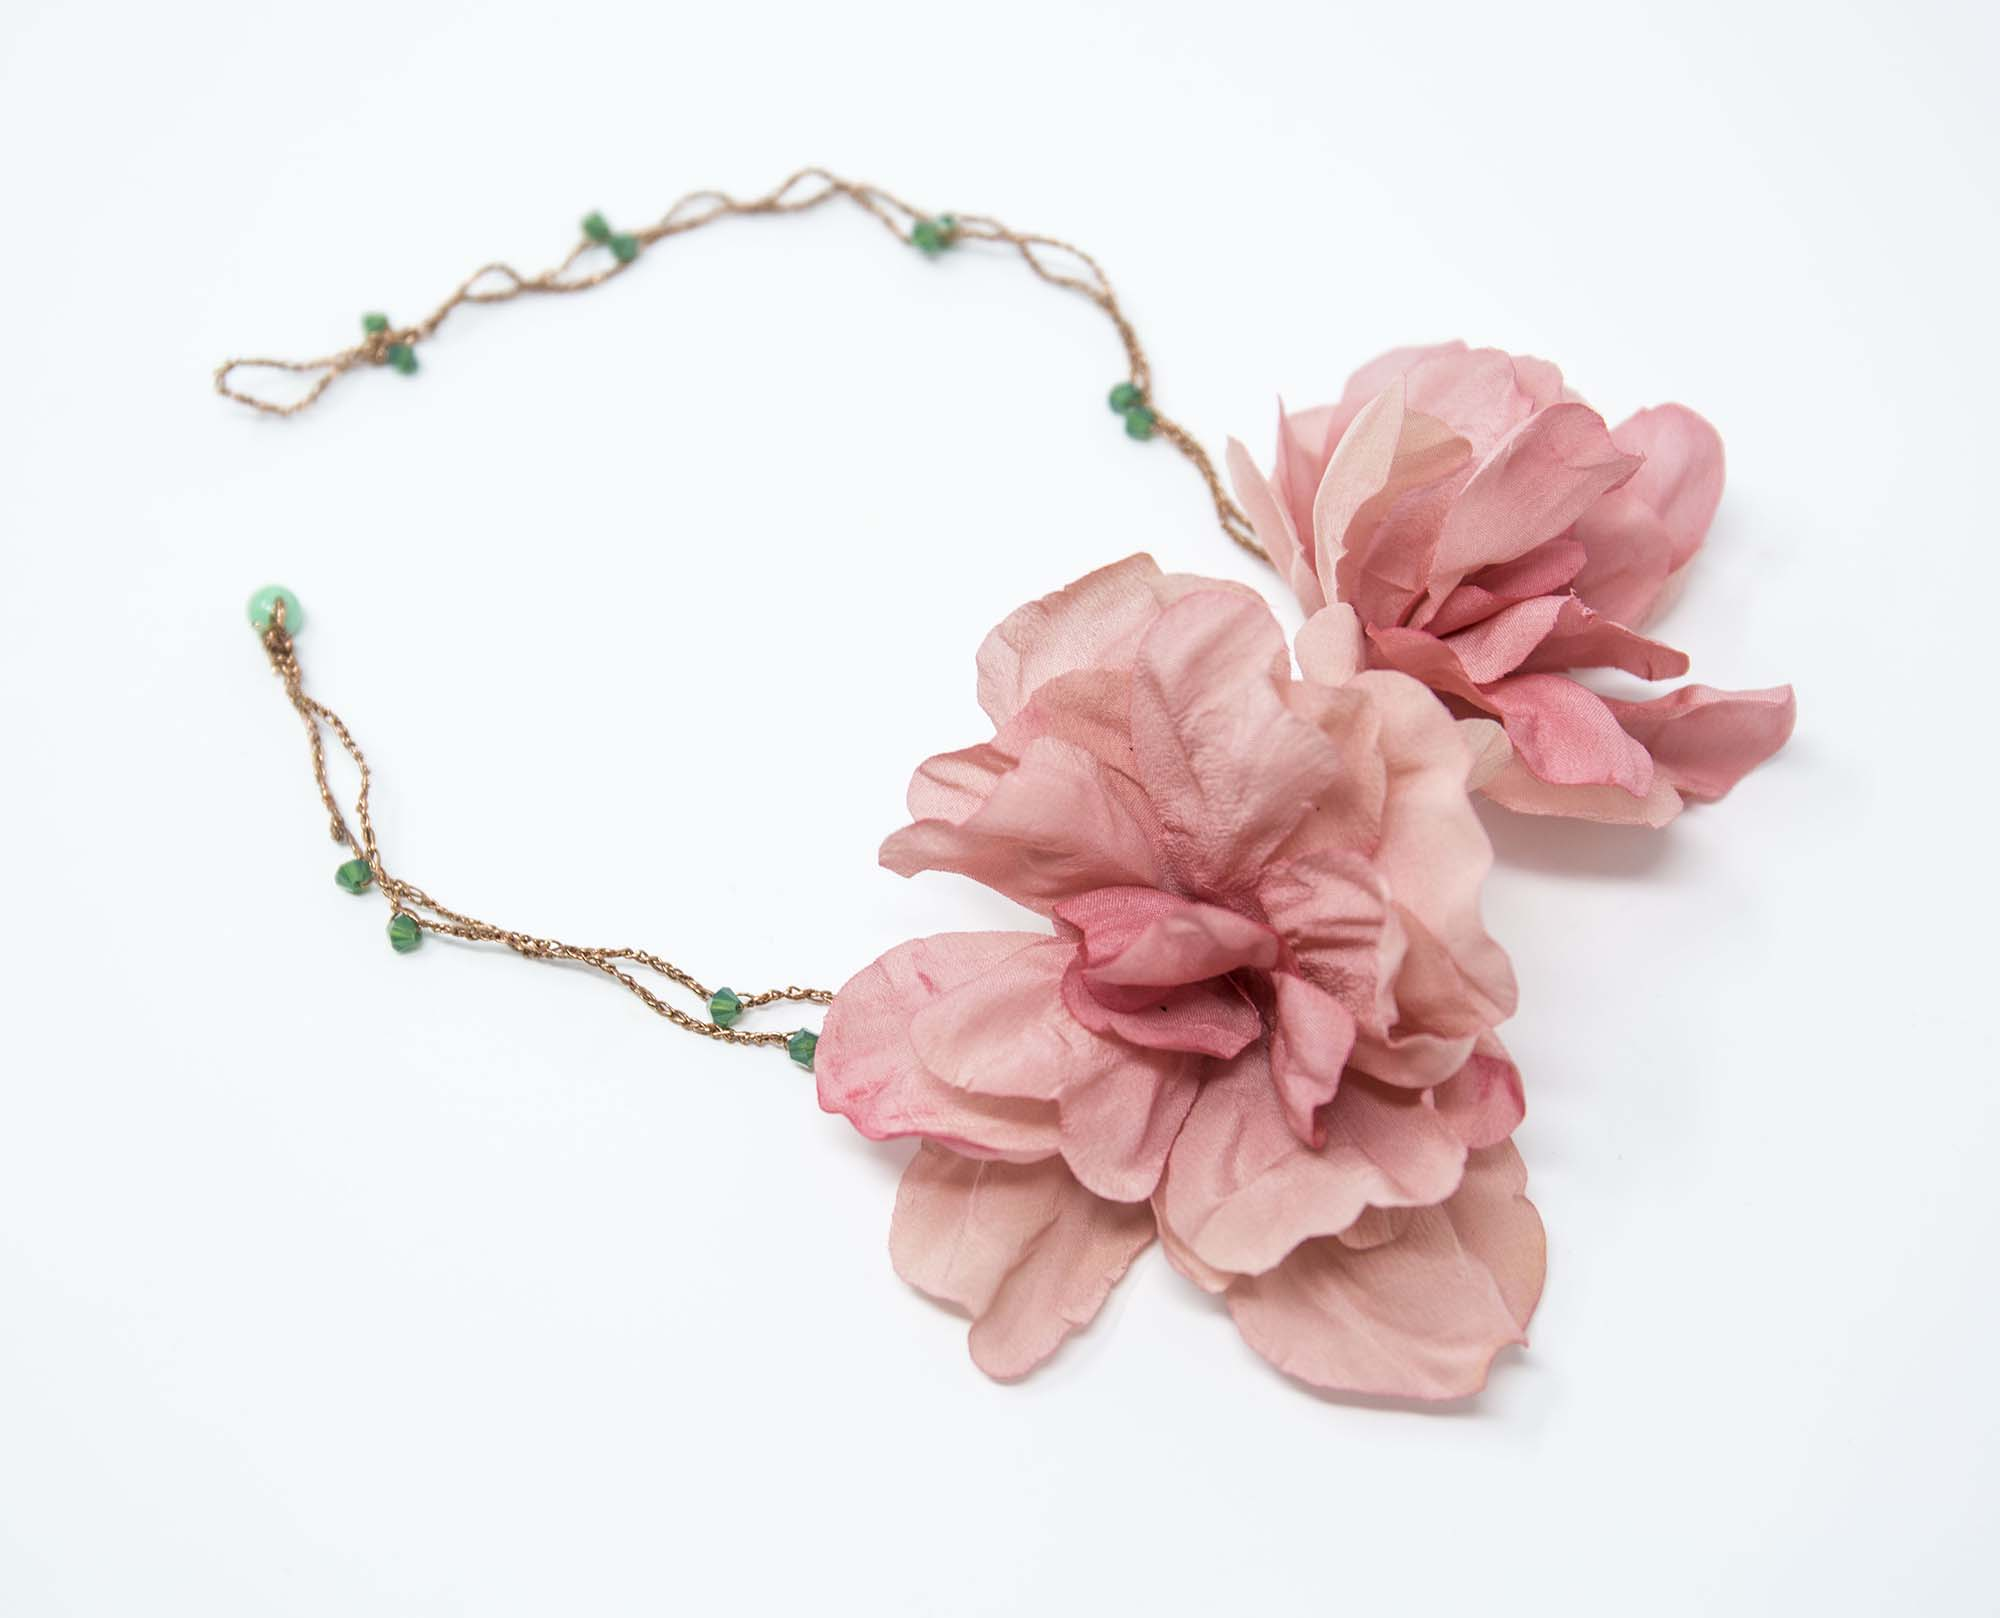 collier vintage style fiori in seta